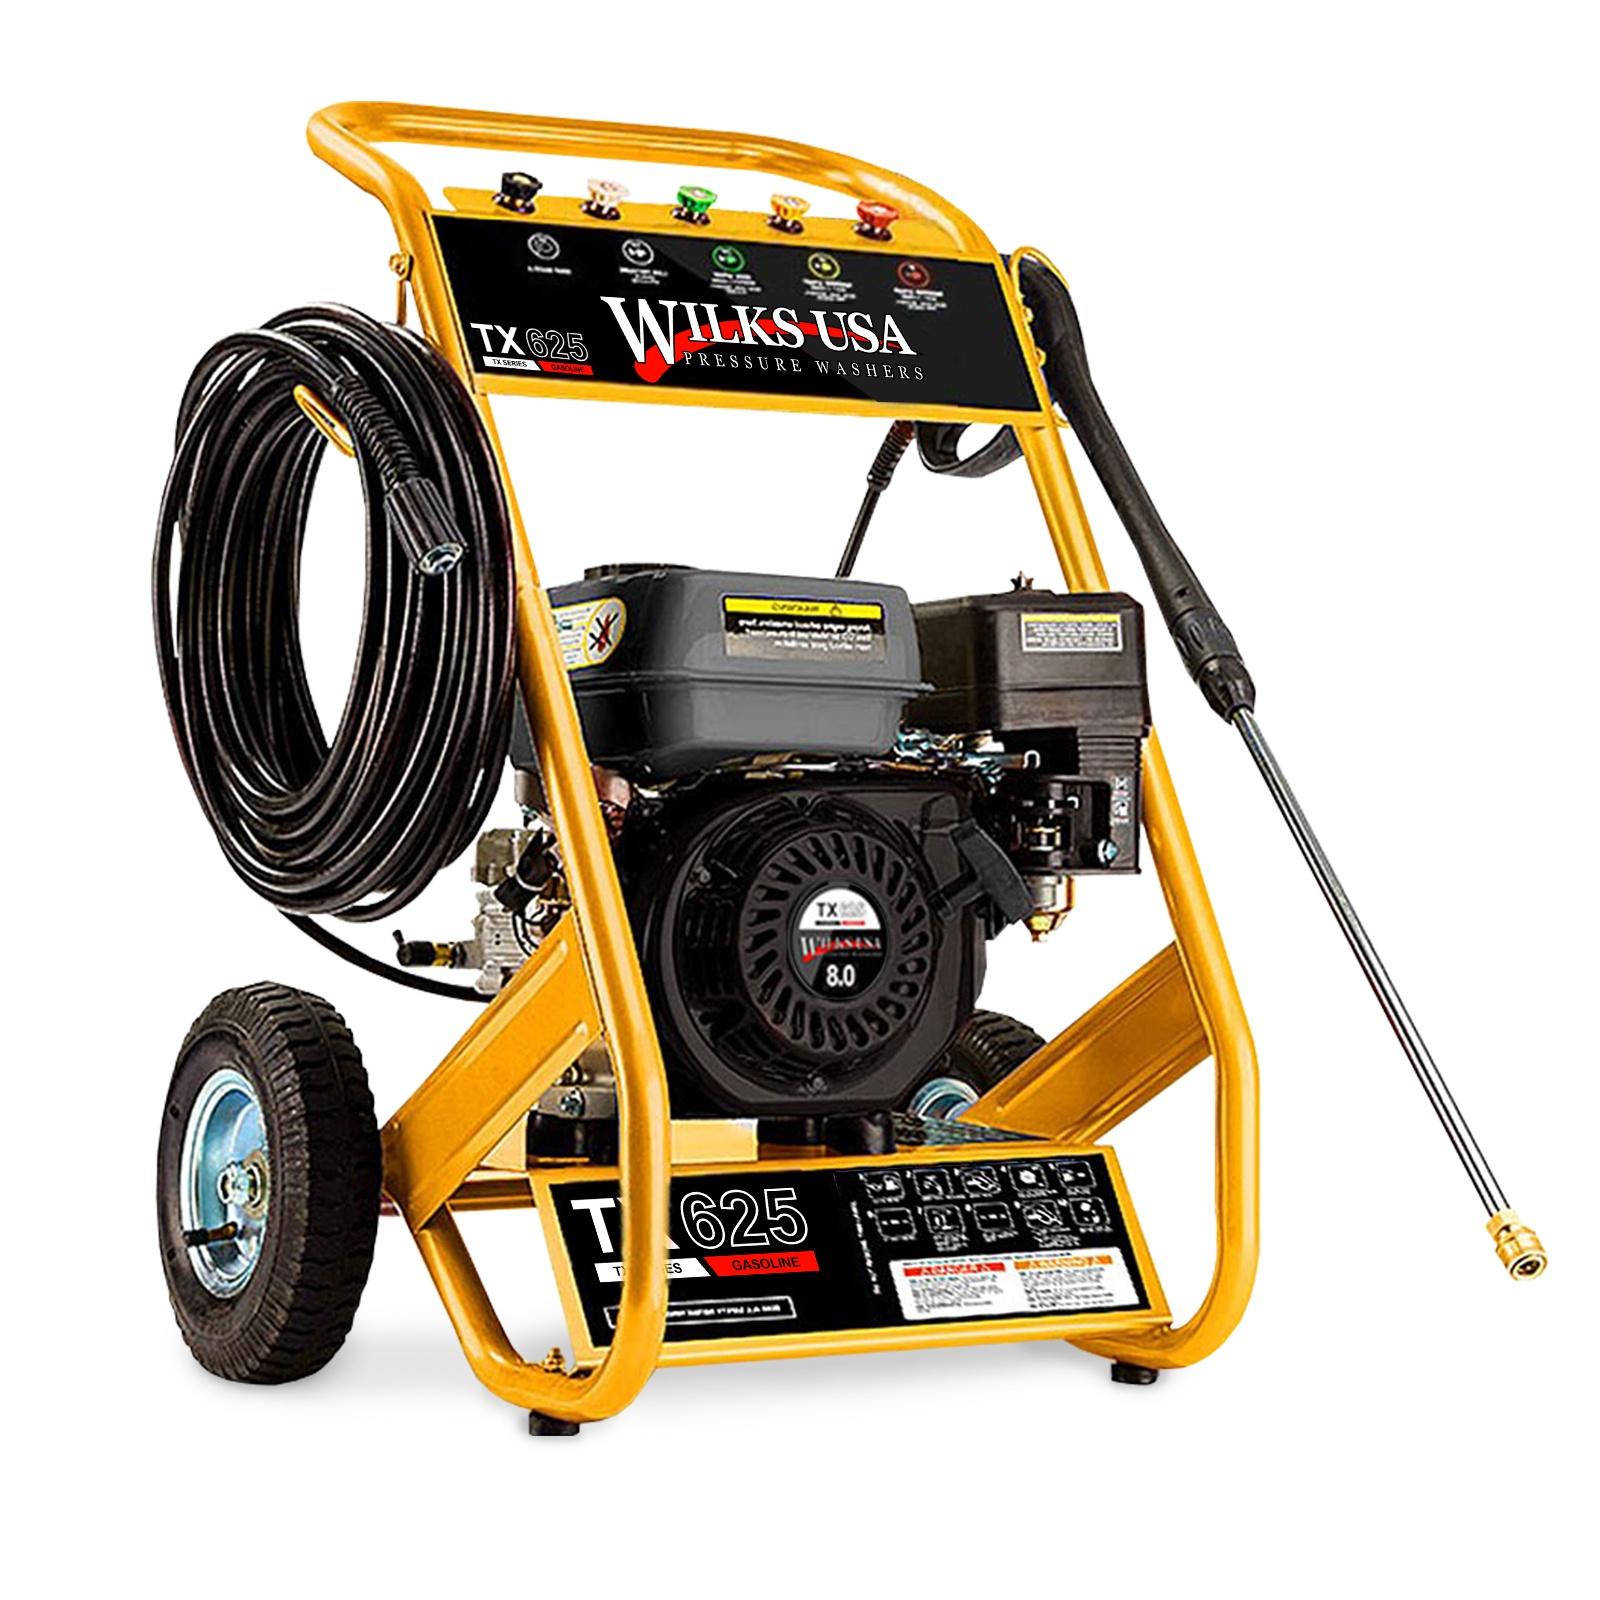 Wilks USA  TX625 Petrol Pressure Washer